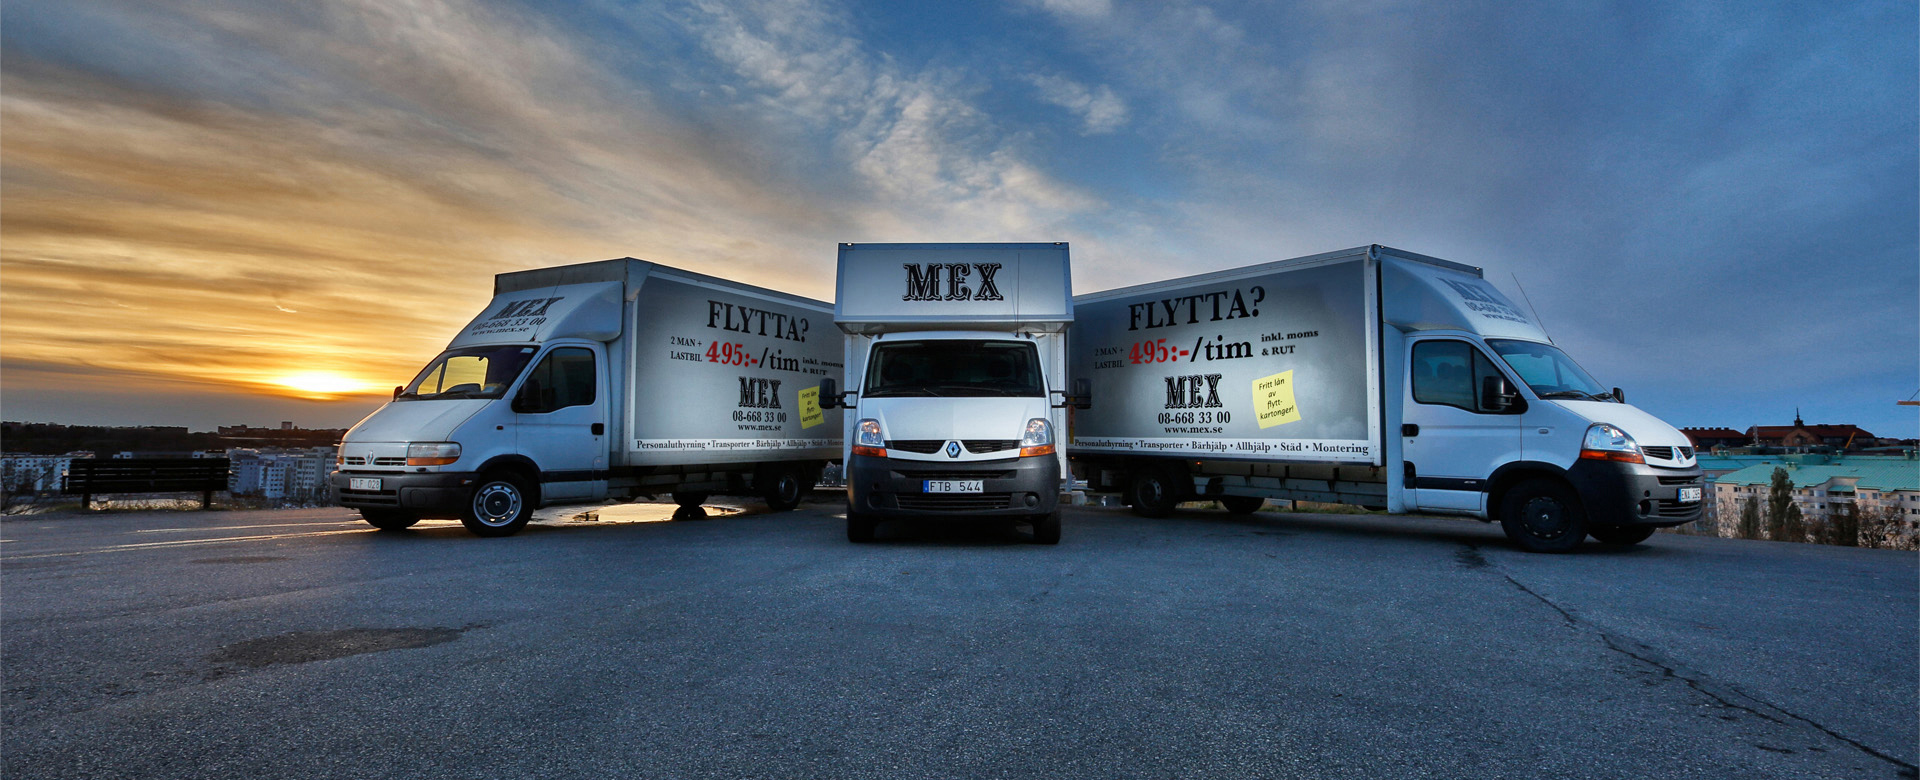 Mex nya flyttbilar